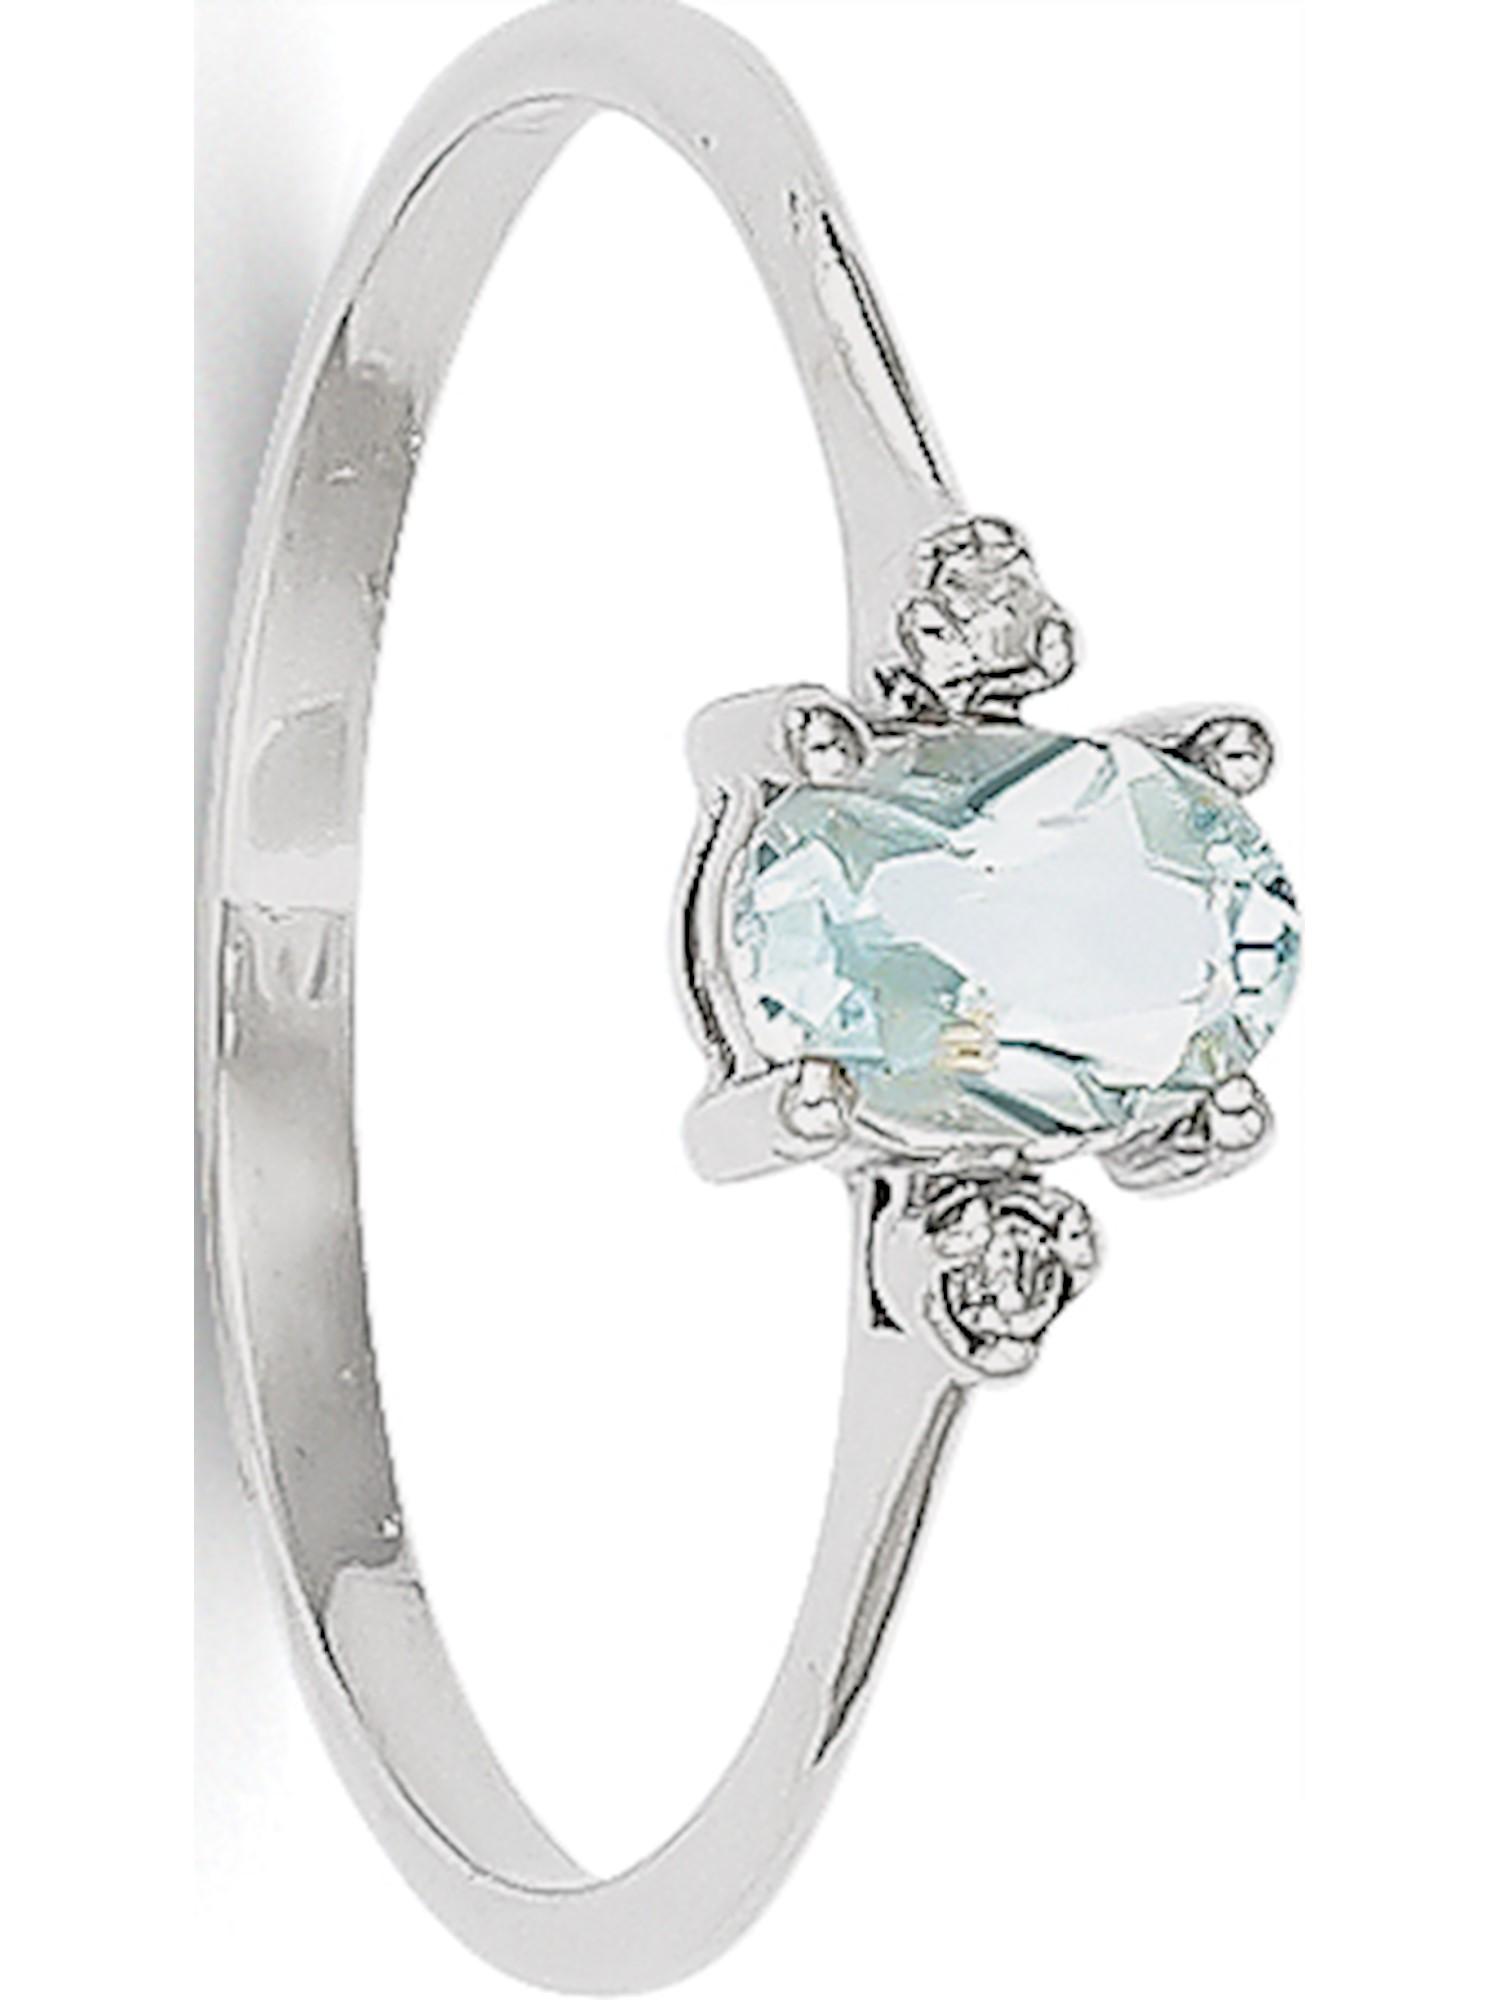 14k White Gold White Diamond & Aquamarine Birthstone Ring by